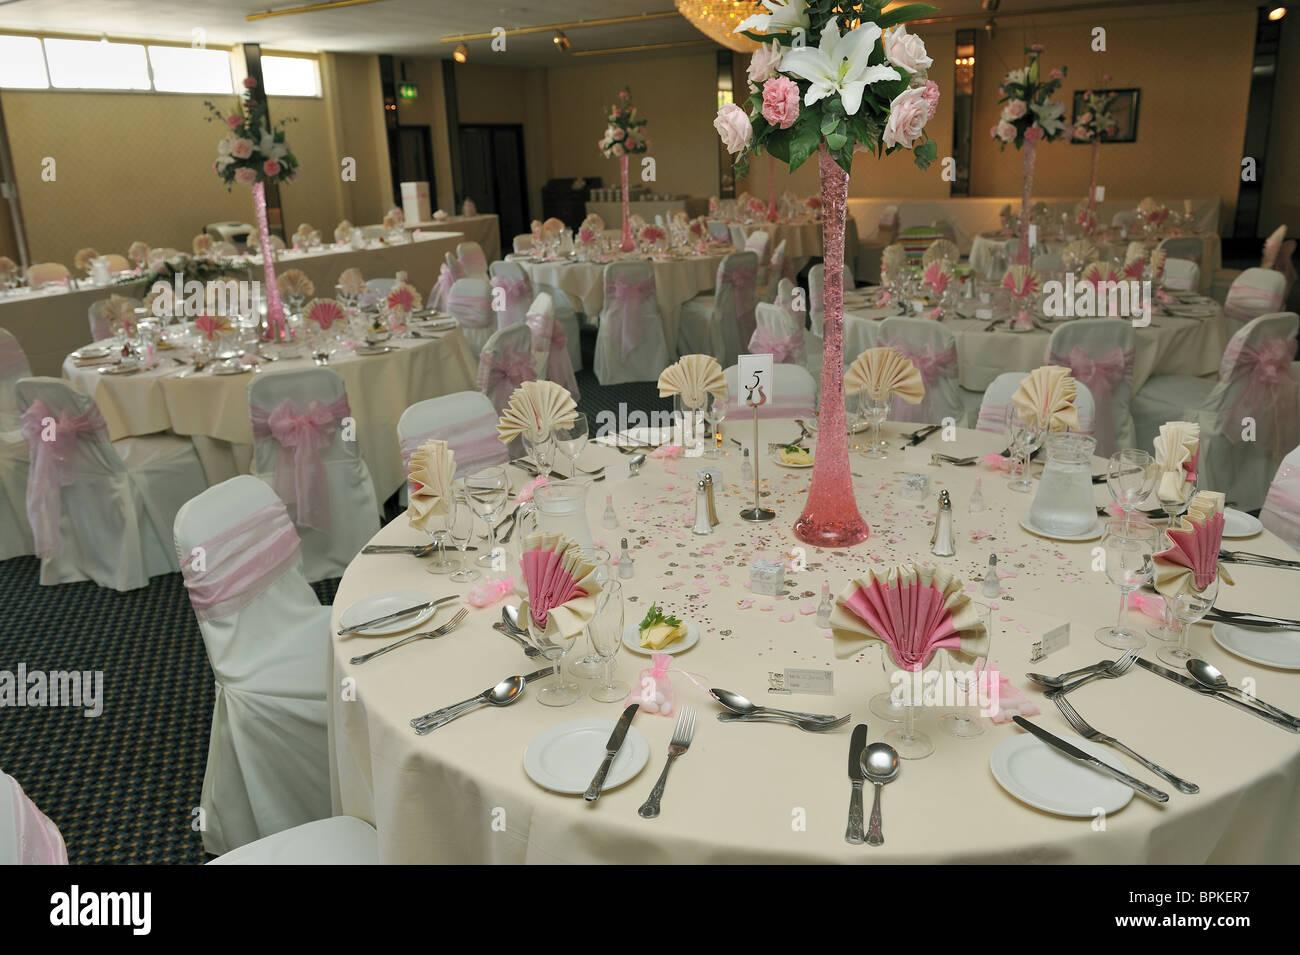 Wedding Reception table layout Stock Photo 31161515  Alamy